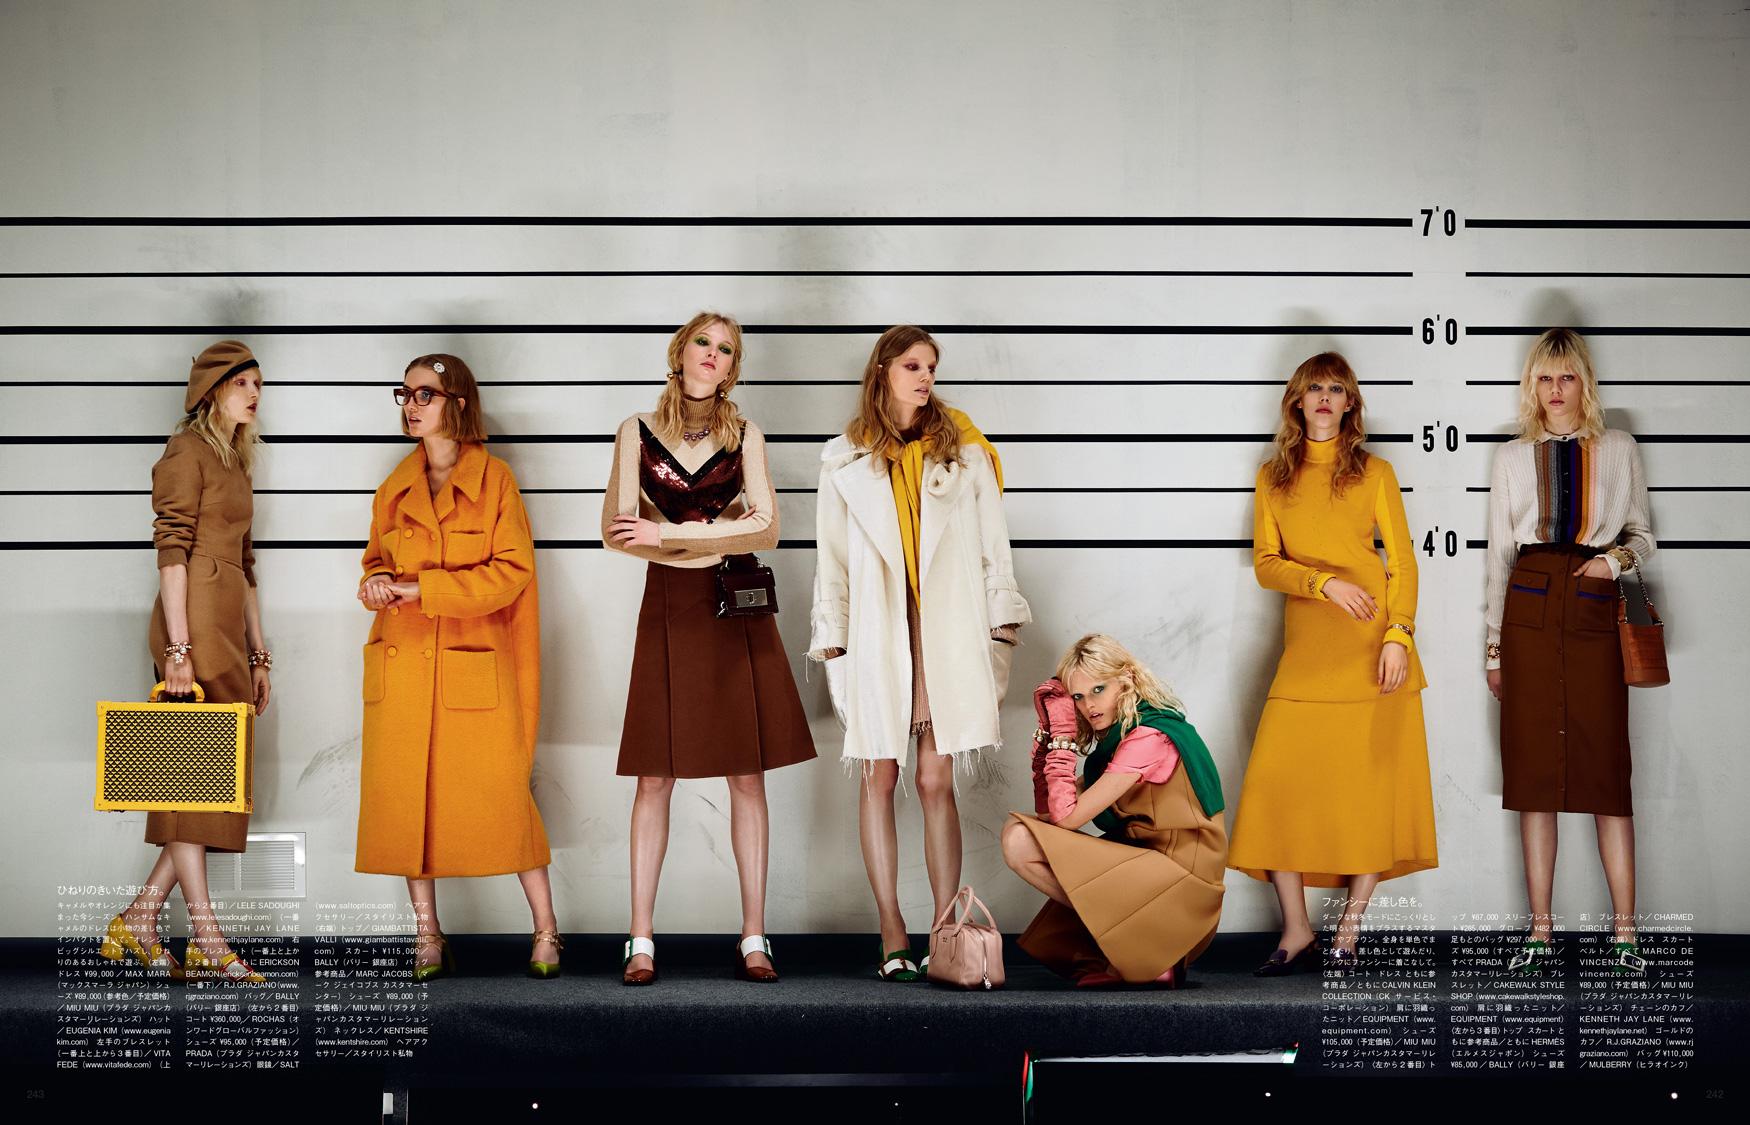 Giovanna-Battaglia-Vogue-Japan-November-2015-Fashion-Line-Up-3.jpg